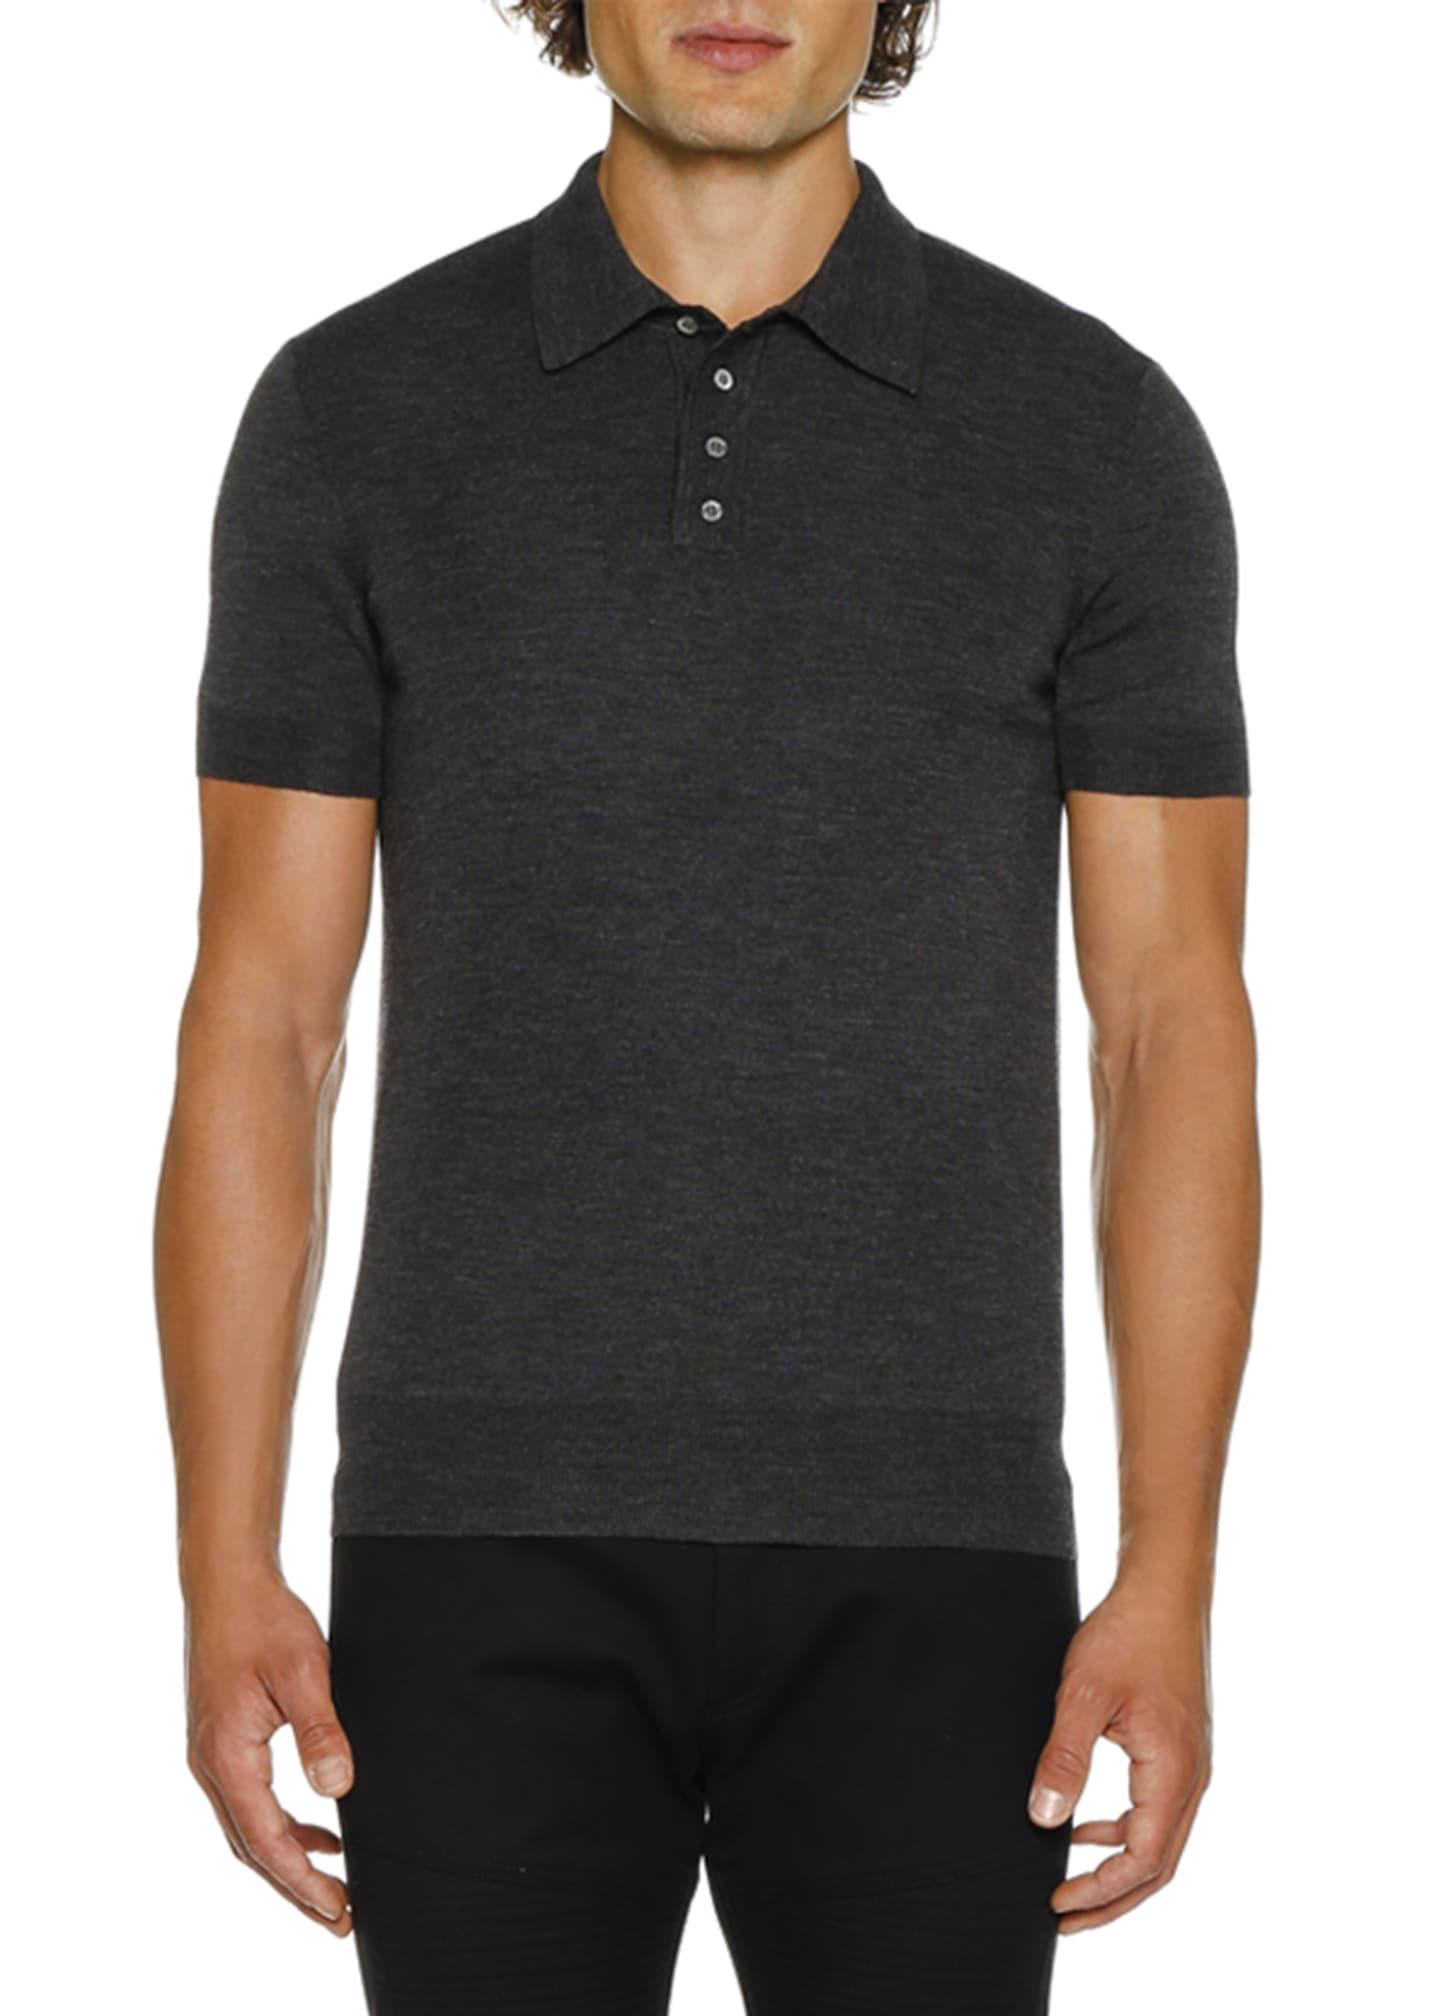 low cost sneakers pretty cool Neil Barrett Men's Short-Sleeve Knitted Polo Shirt - Bergdorf Goodman